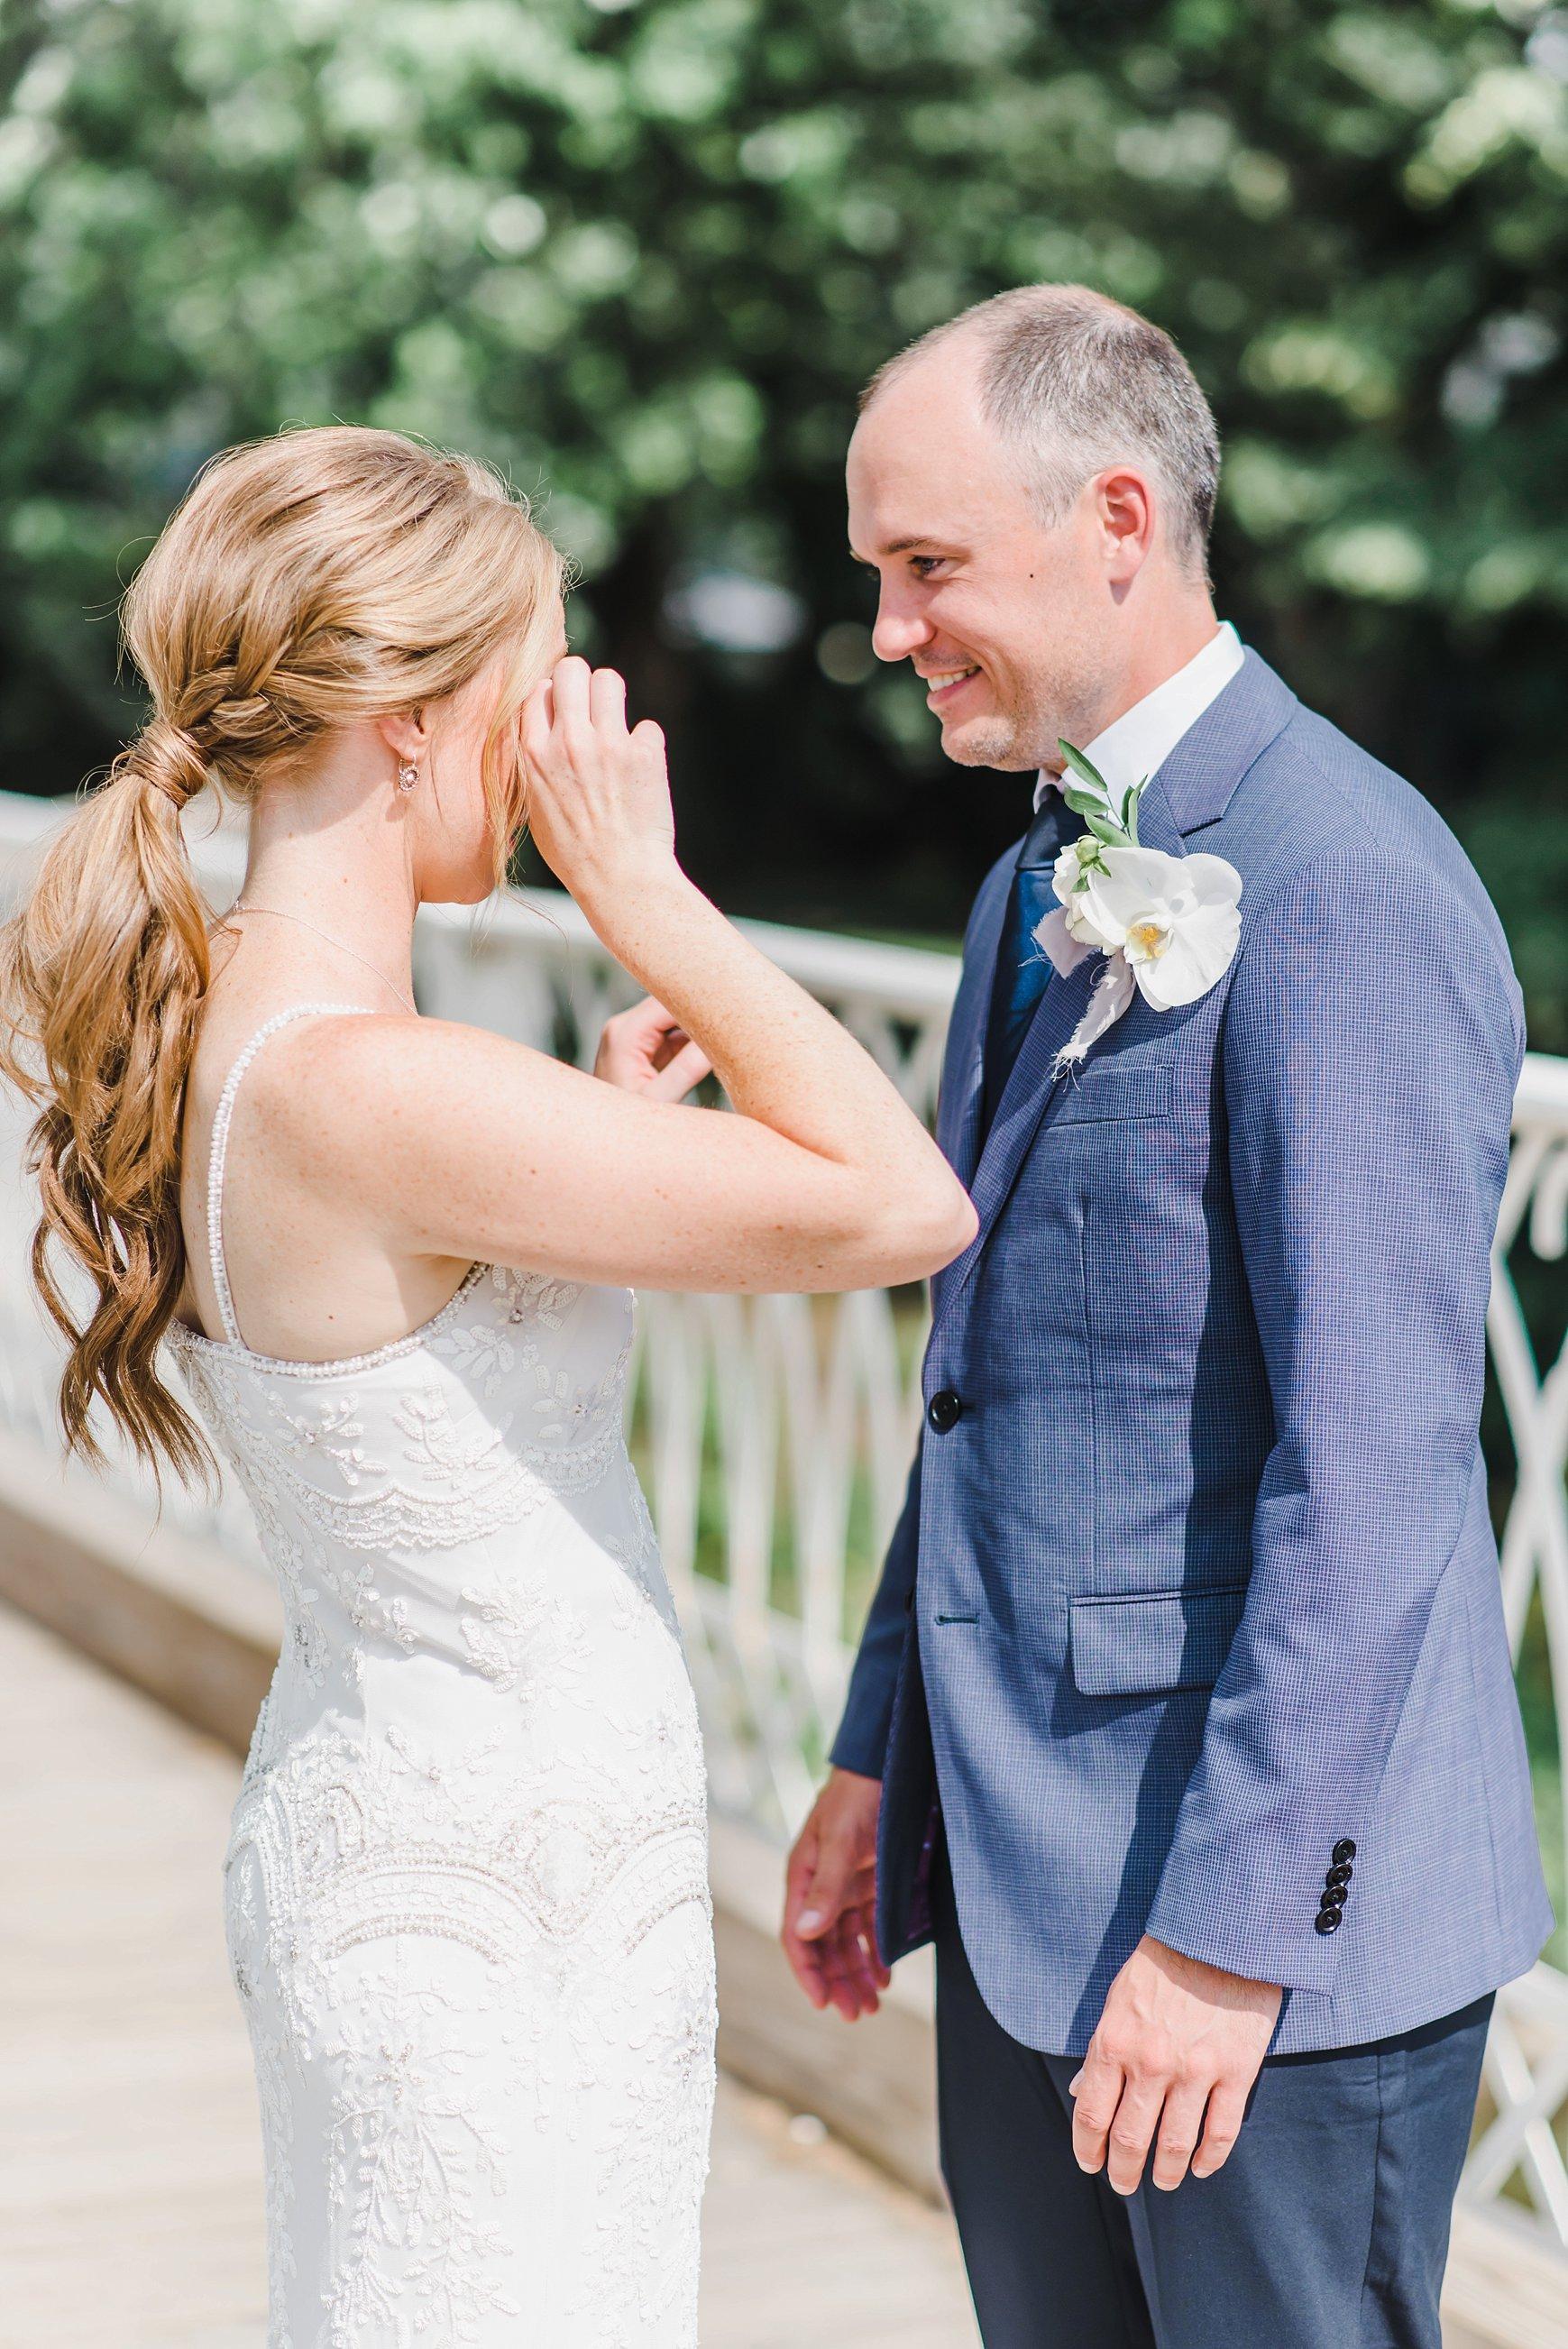 light airy indie fine art ottawa wedding photographer | Ali and Batoul Photography_0633.jpg